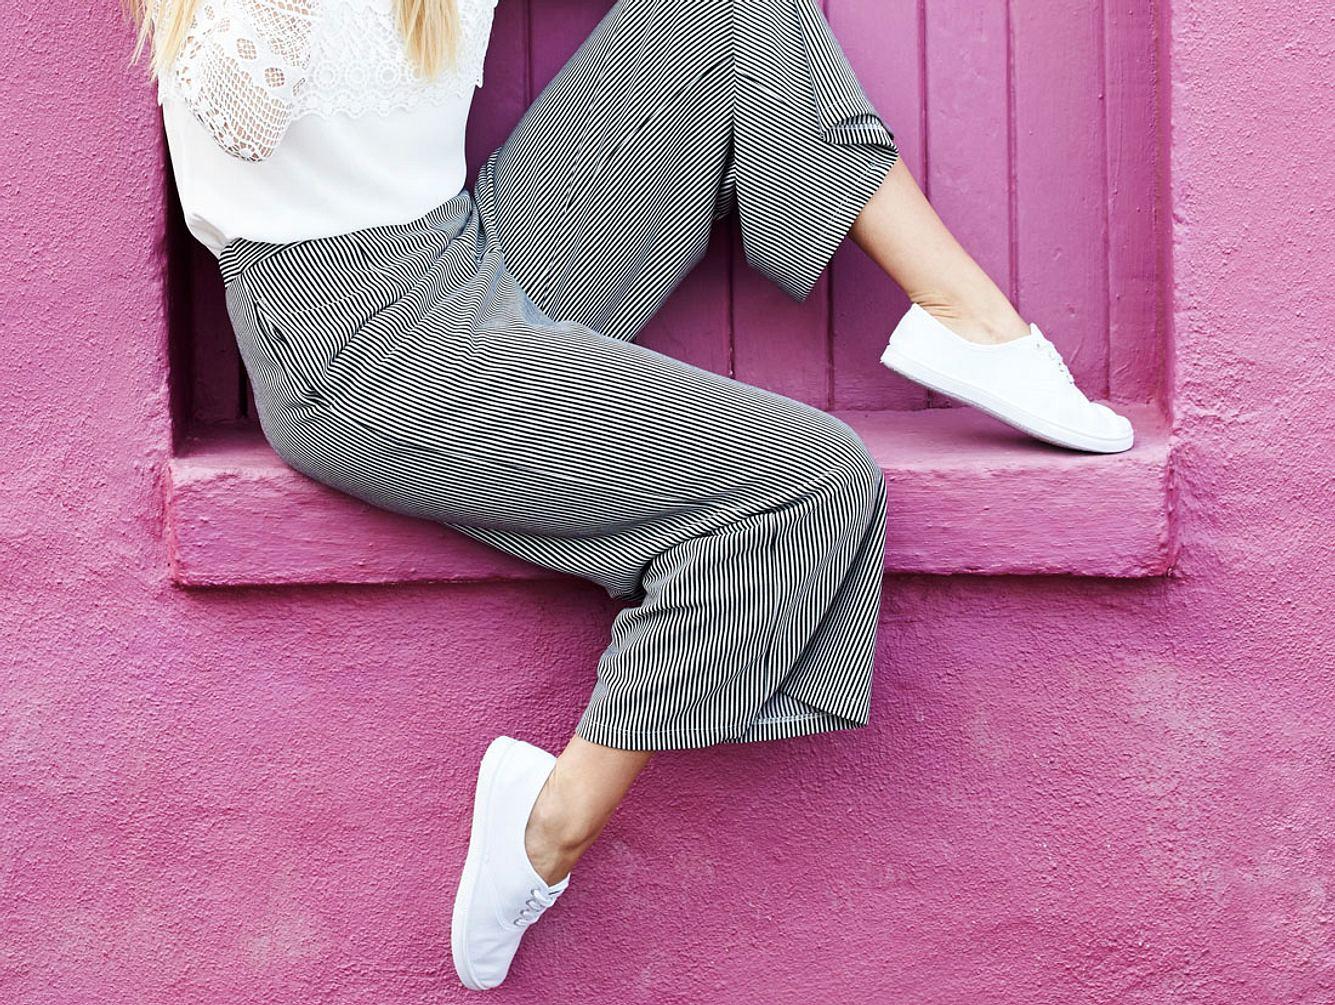 Culotte kombinieren: Model mit Culotte-Hose